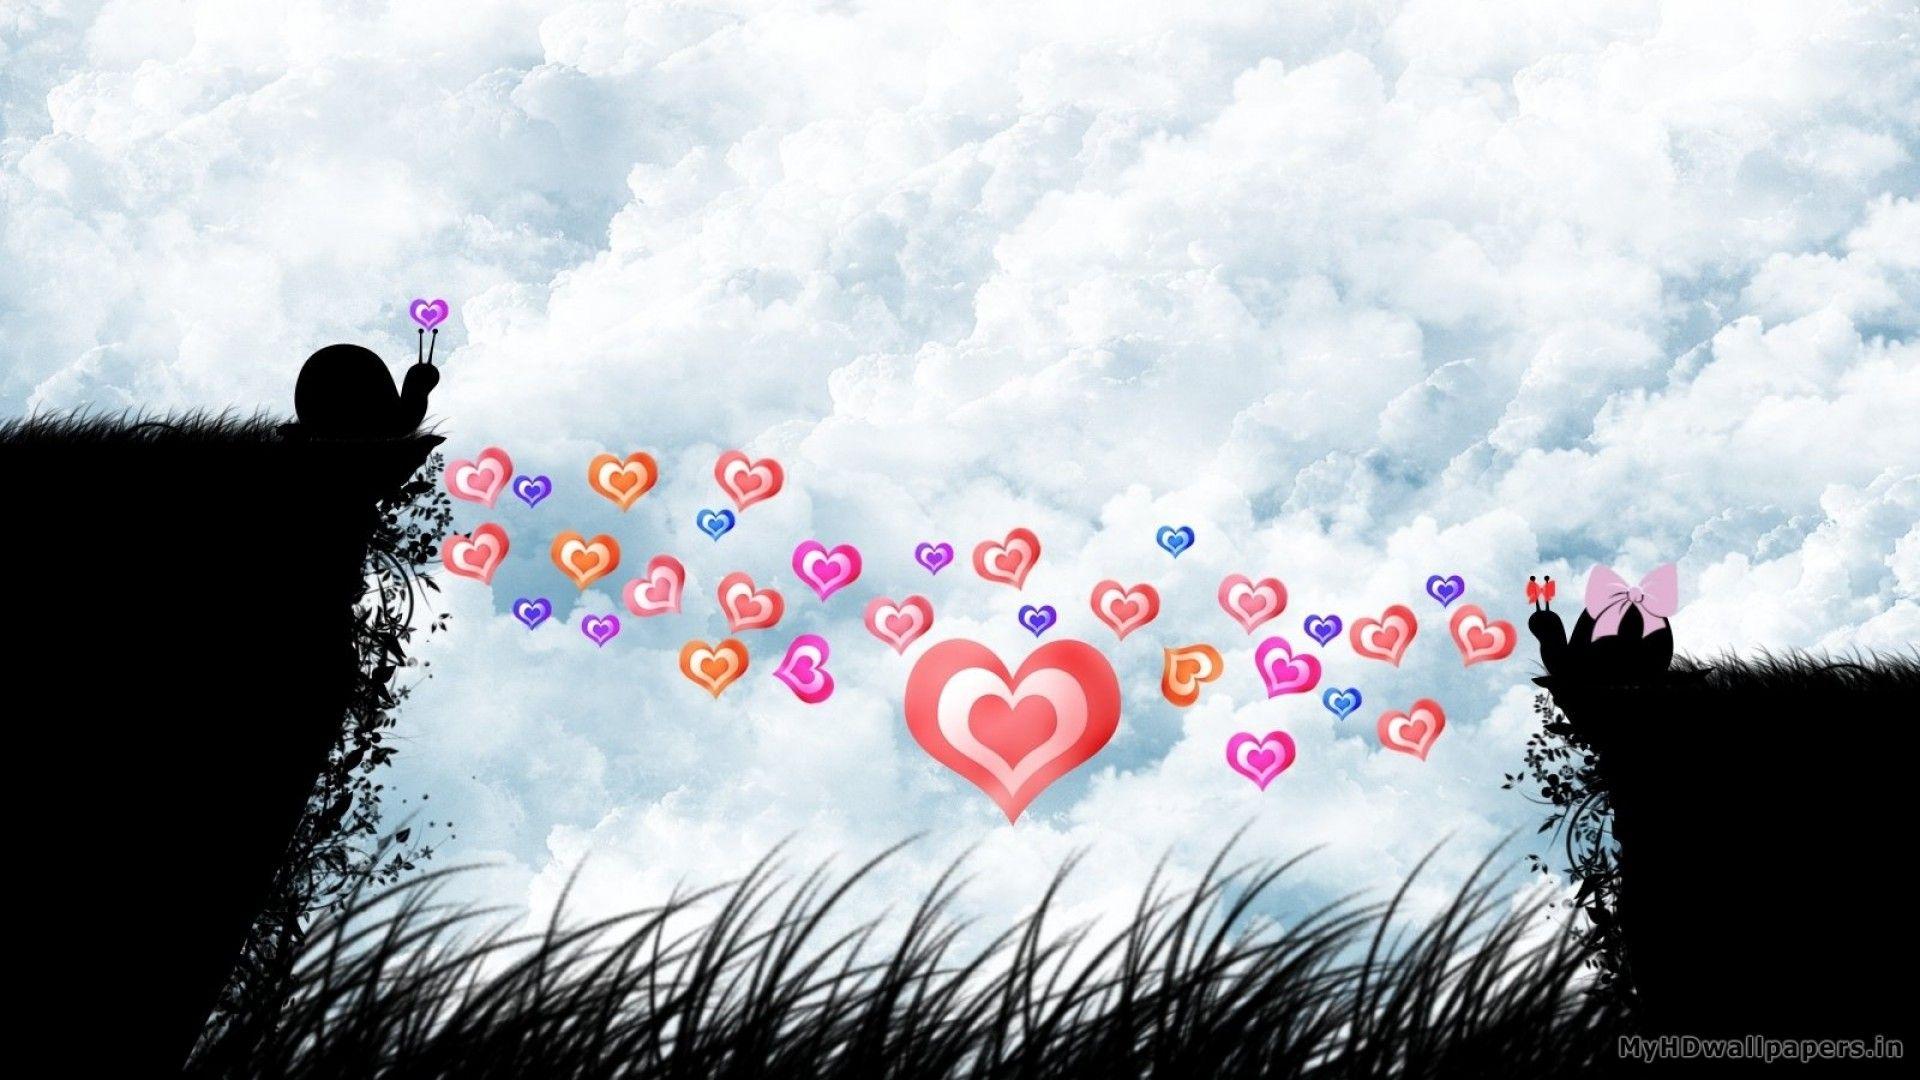 joy of love    http://www.superwallpapers.in/wallpaper/joy-of-love.html